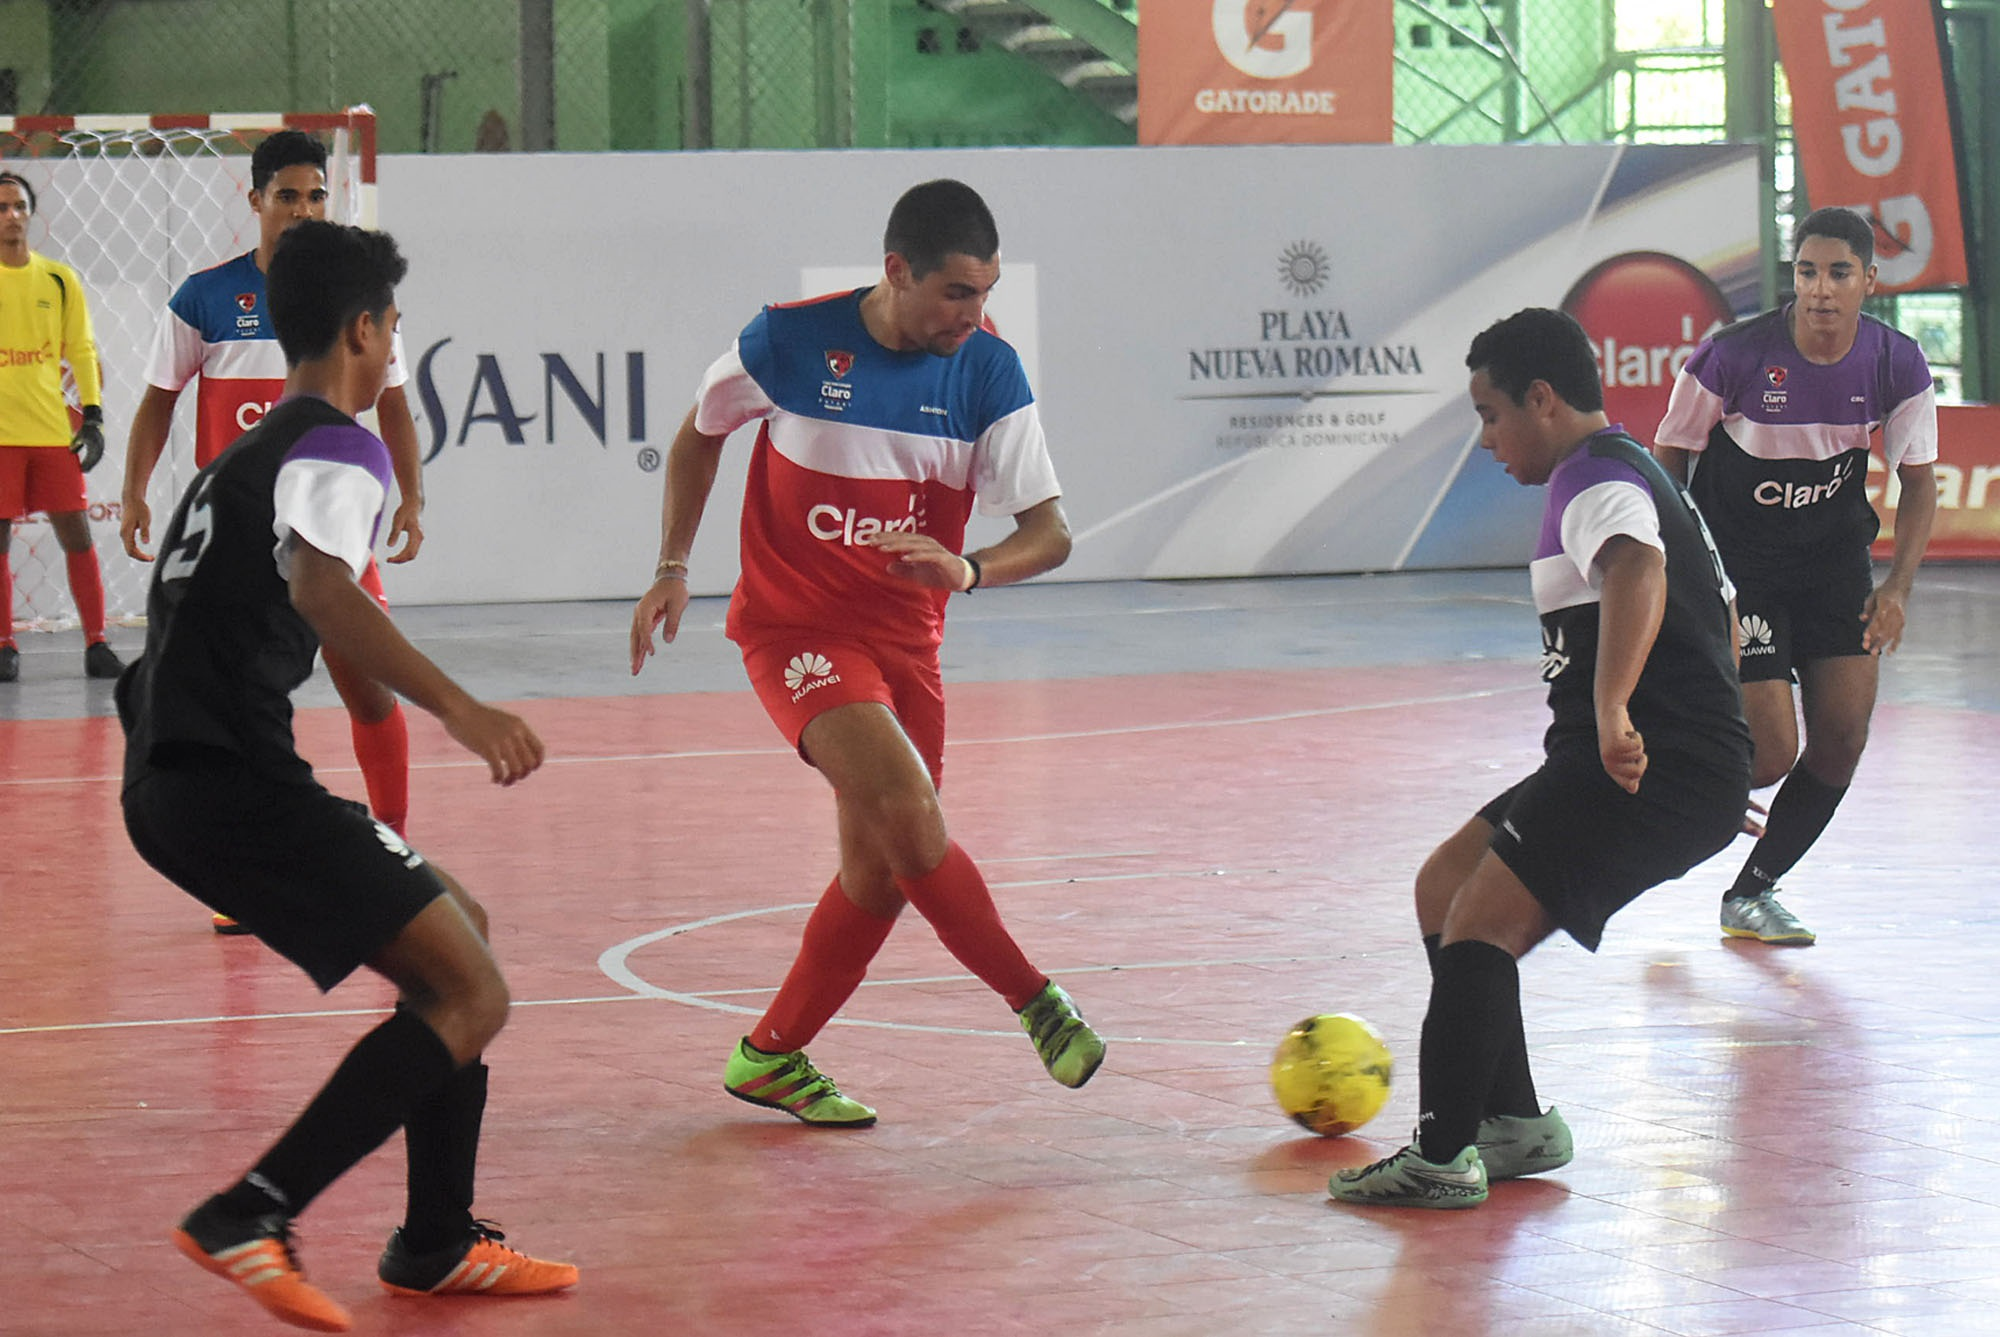 Sek Las Américas le ganó a Cardenal Sancha en Futsal